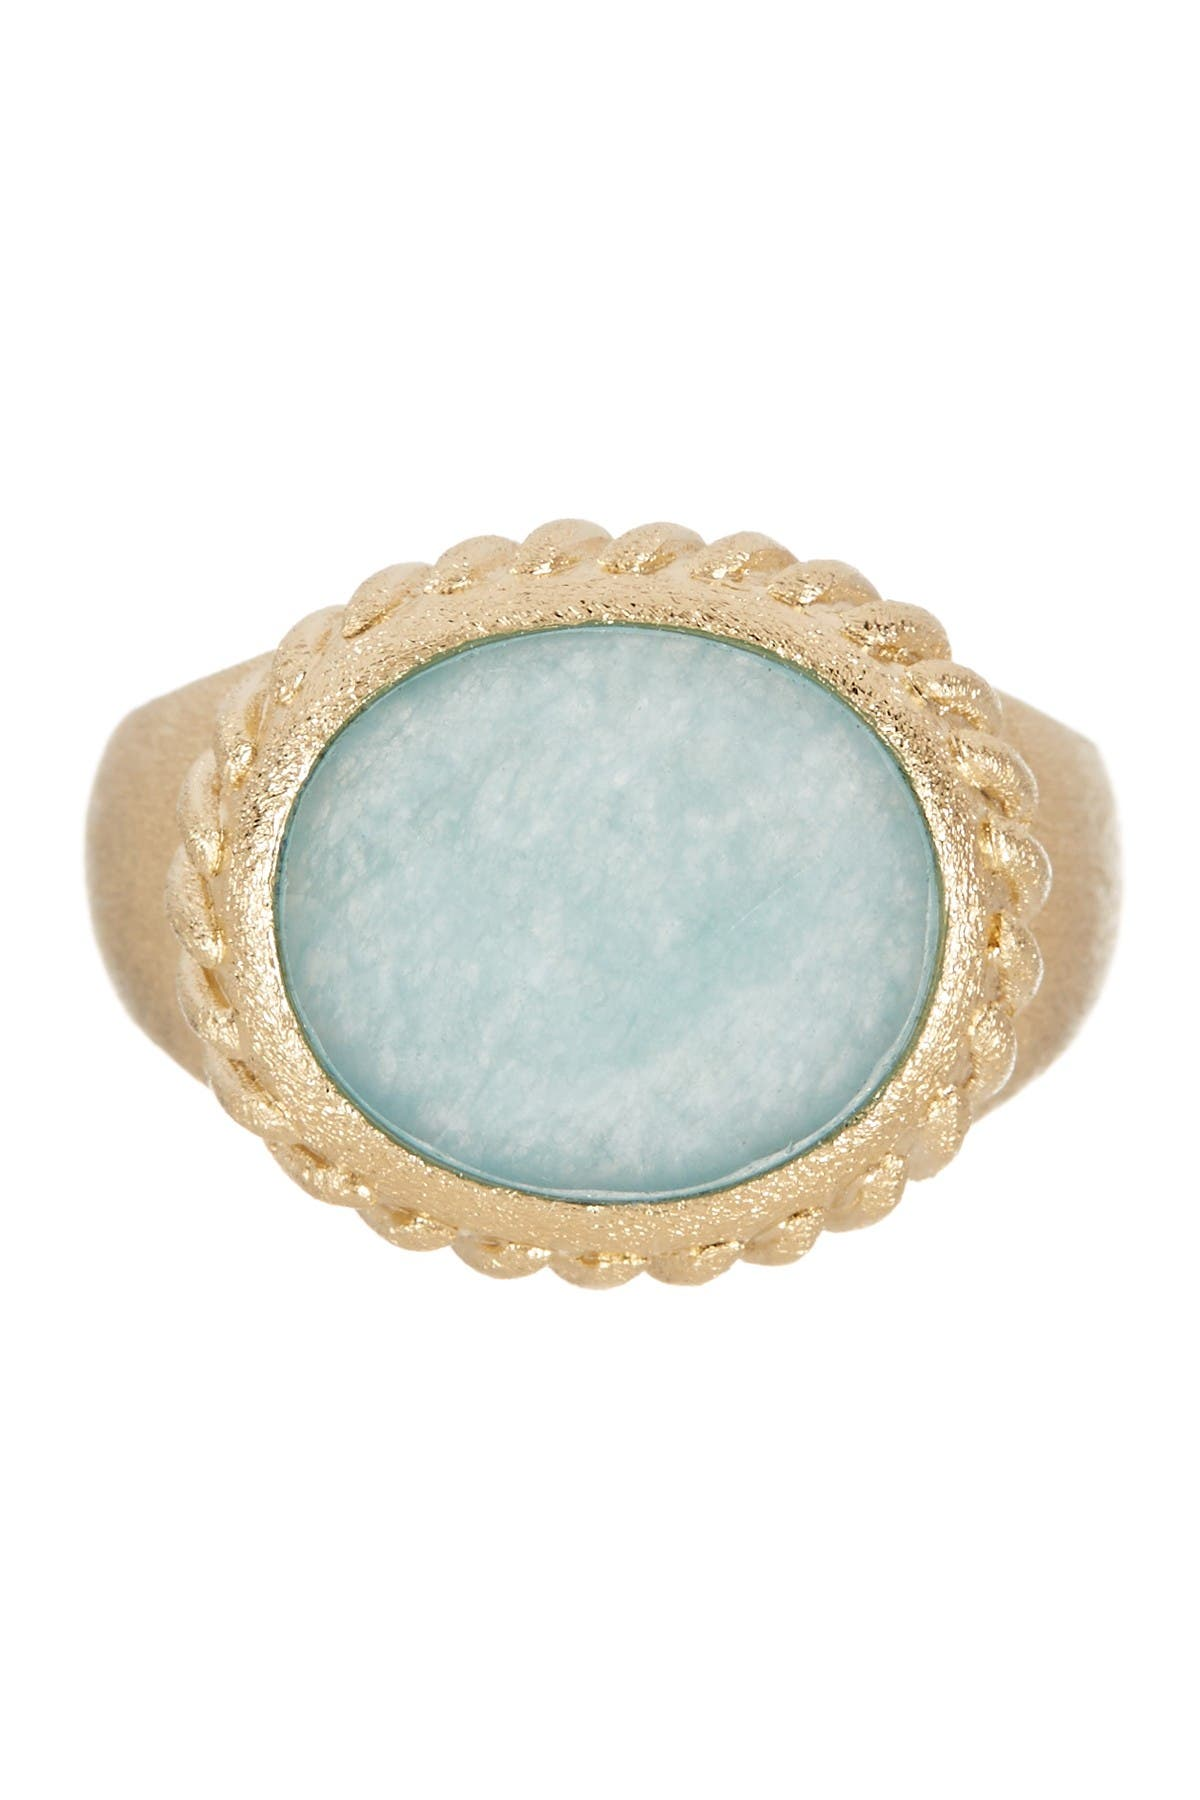 Image of Rivka Friedman Twisted Bezel Oval Faceted Caribbean Blue Quartzite Satin Ring